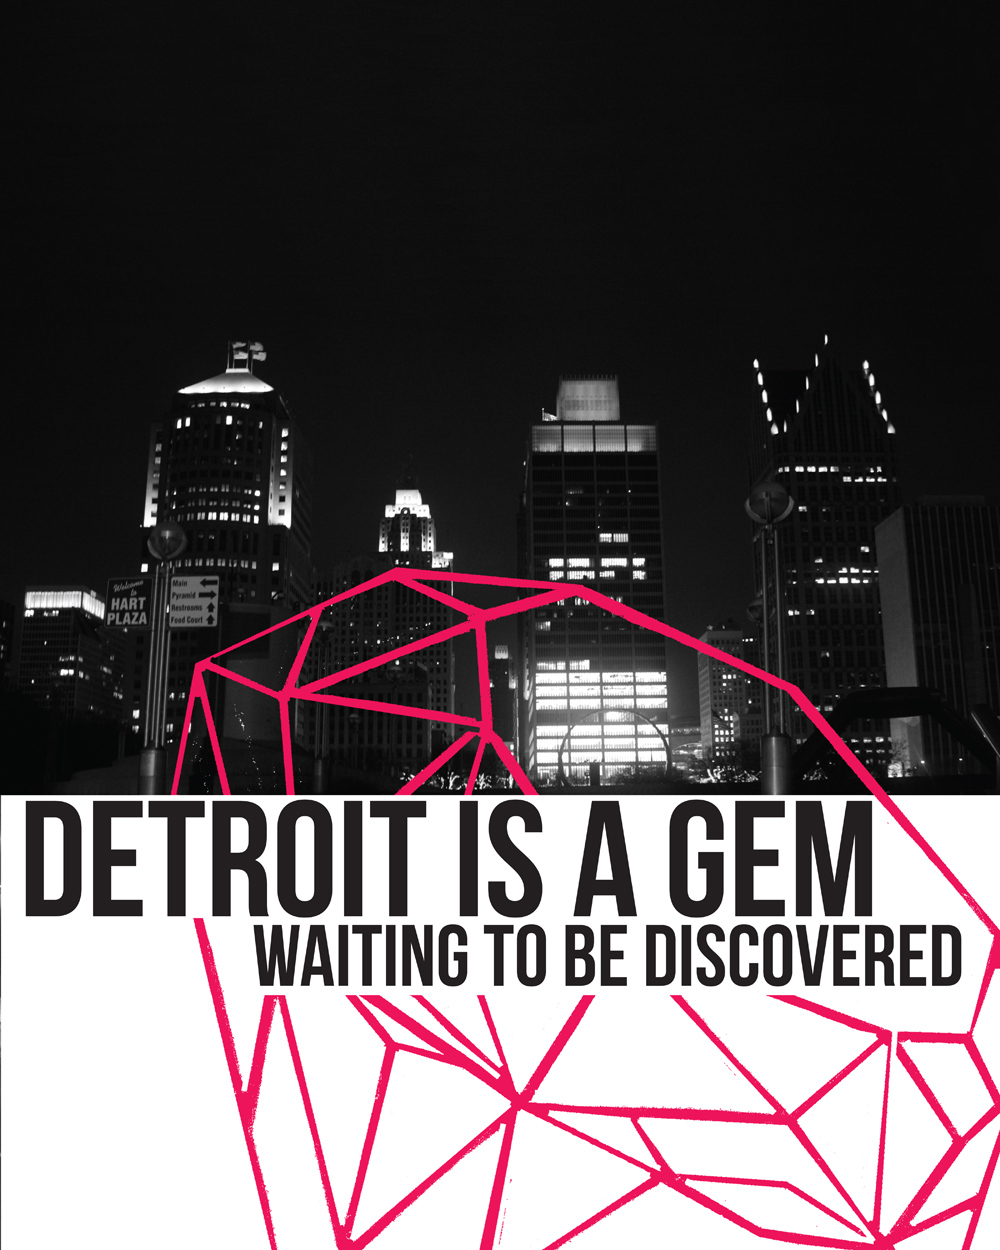 michael-hnatiuk-detroit-stories-3g